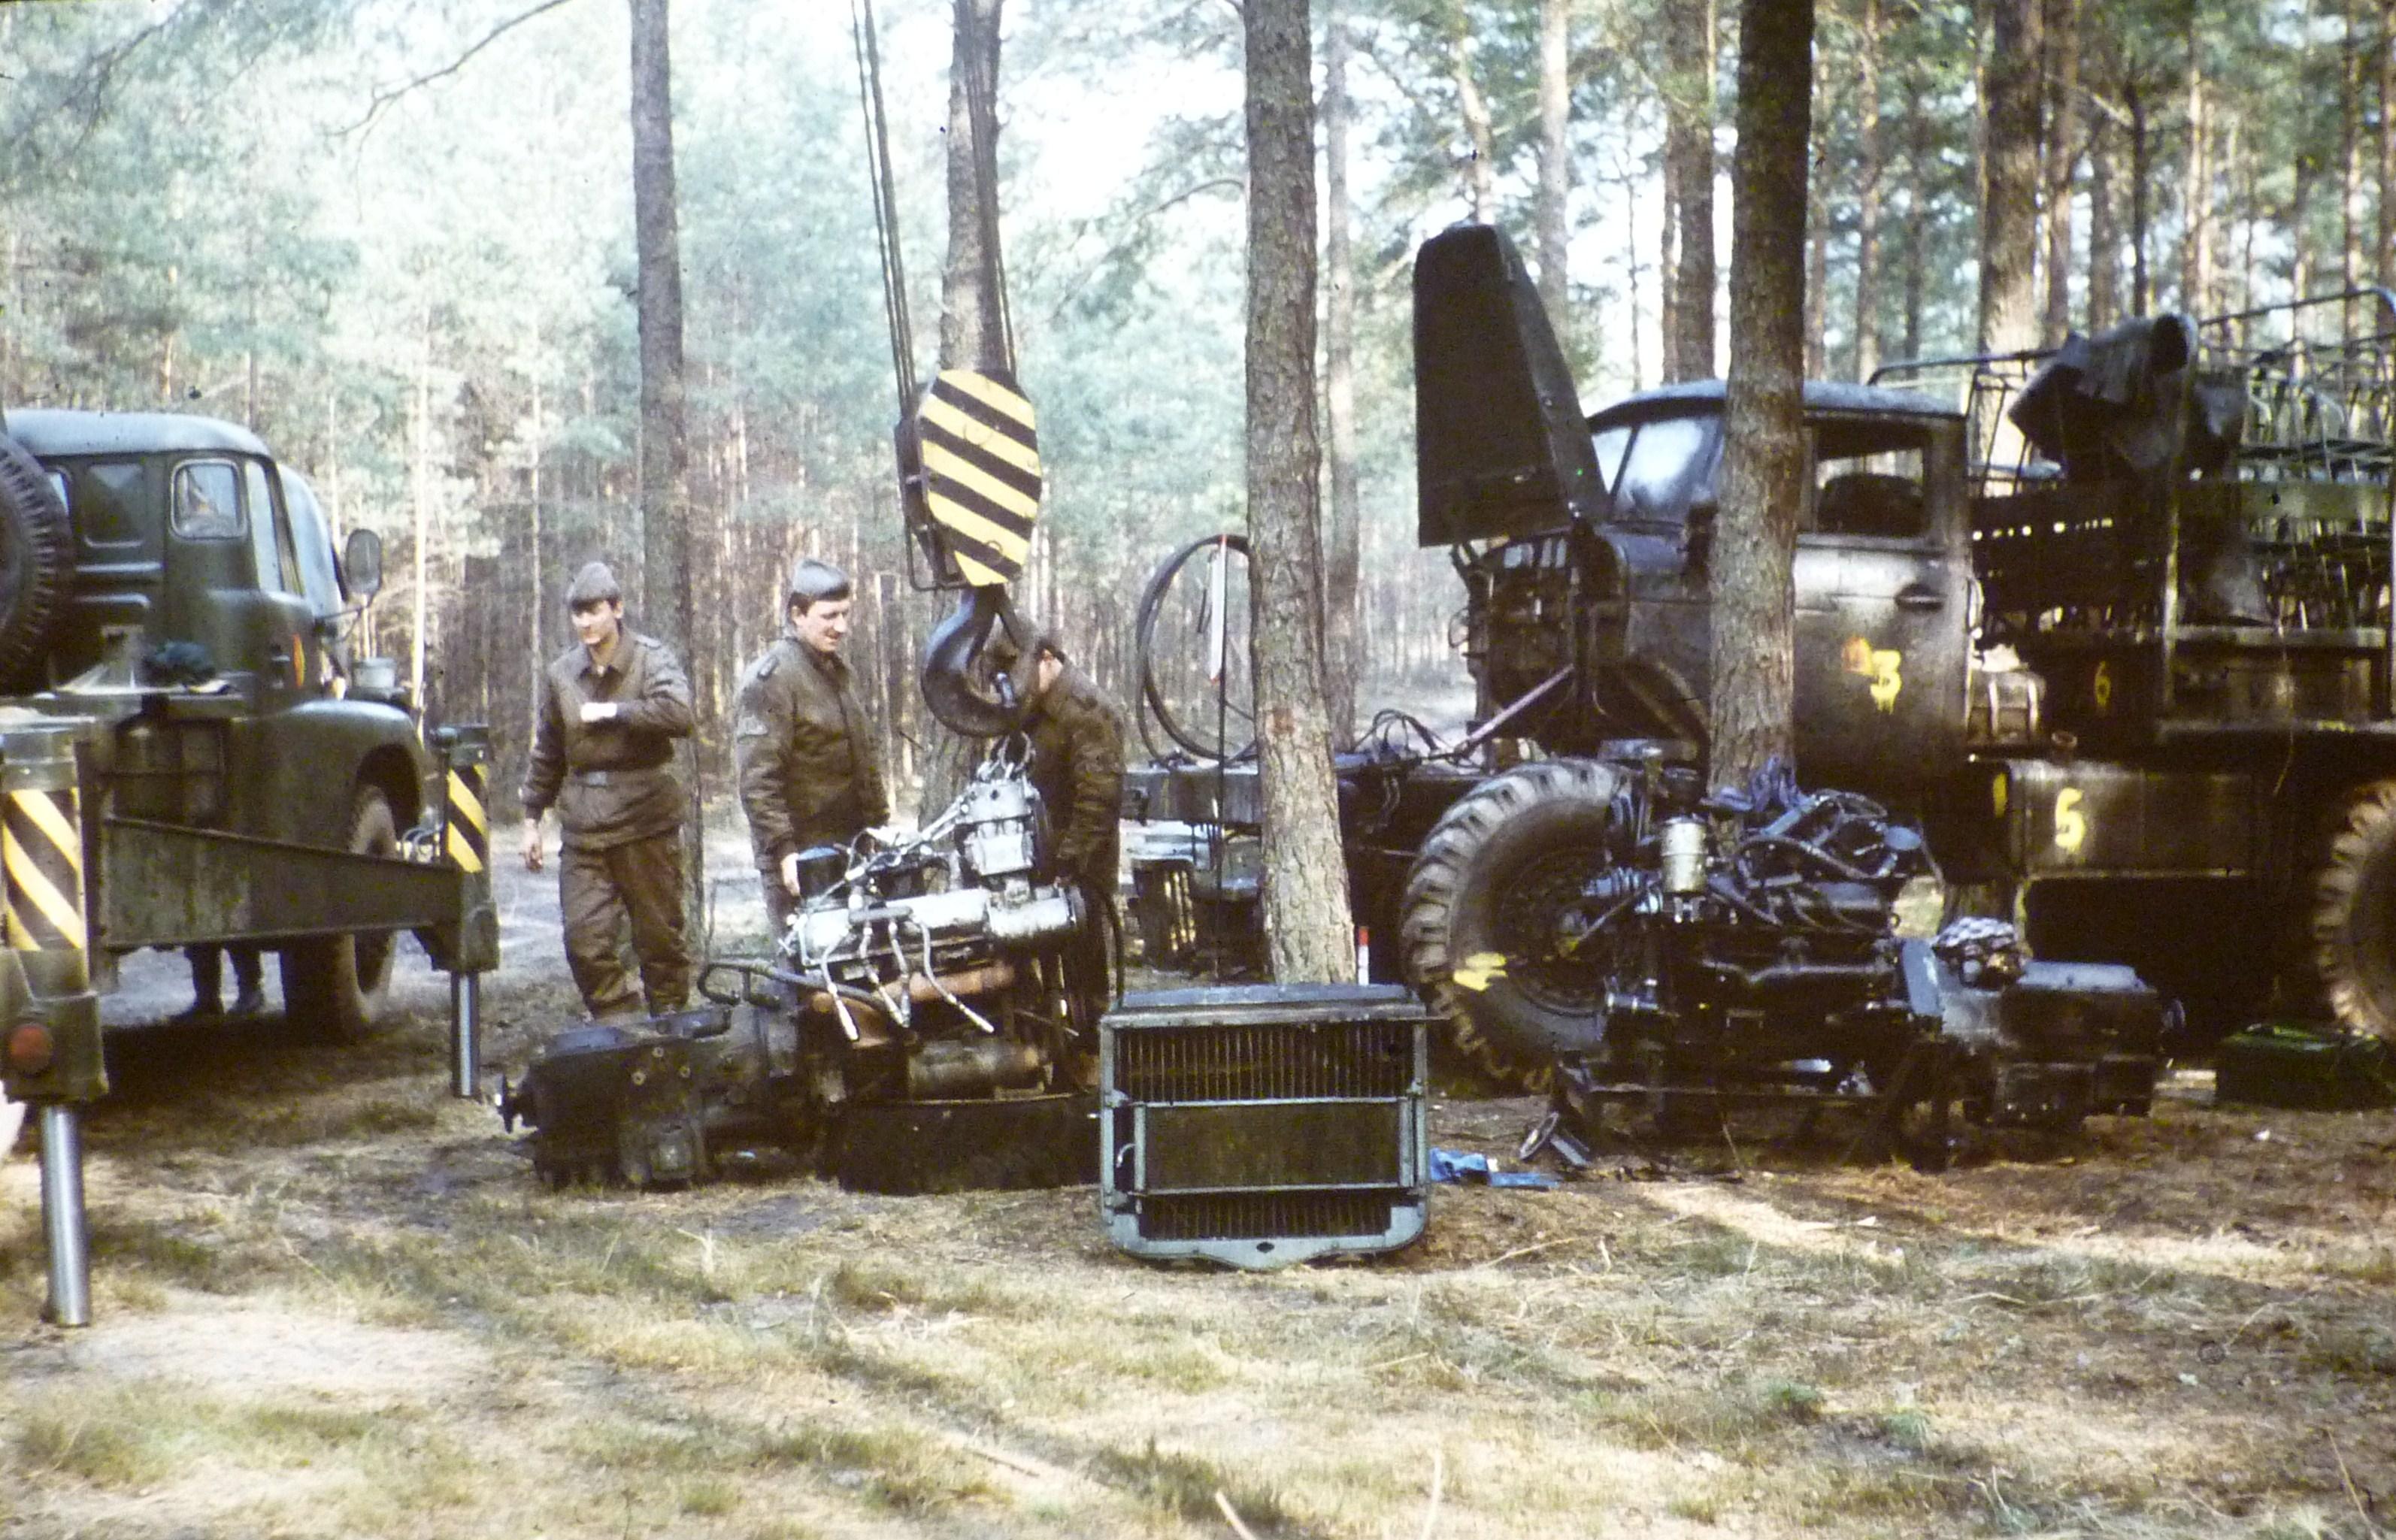 22. mittlere Inst. Kfz. Ural 375 D